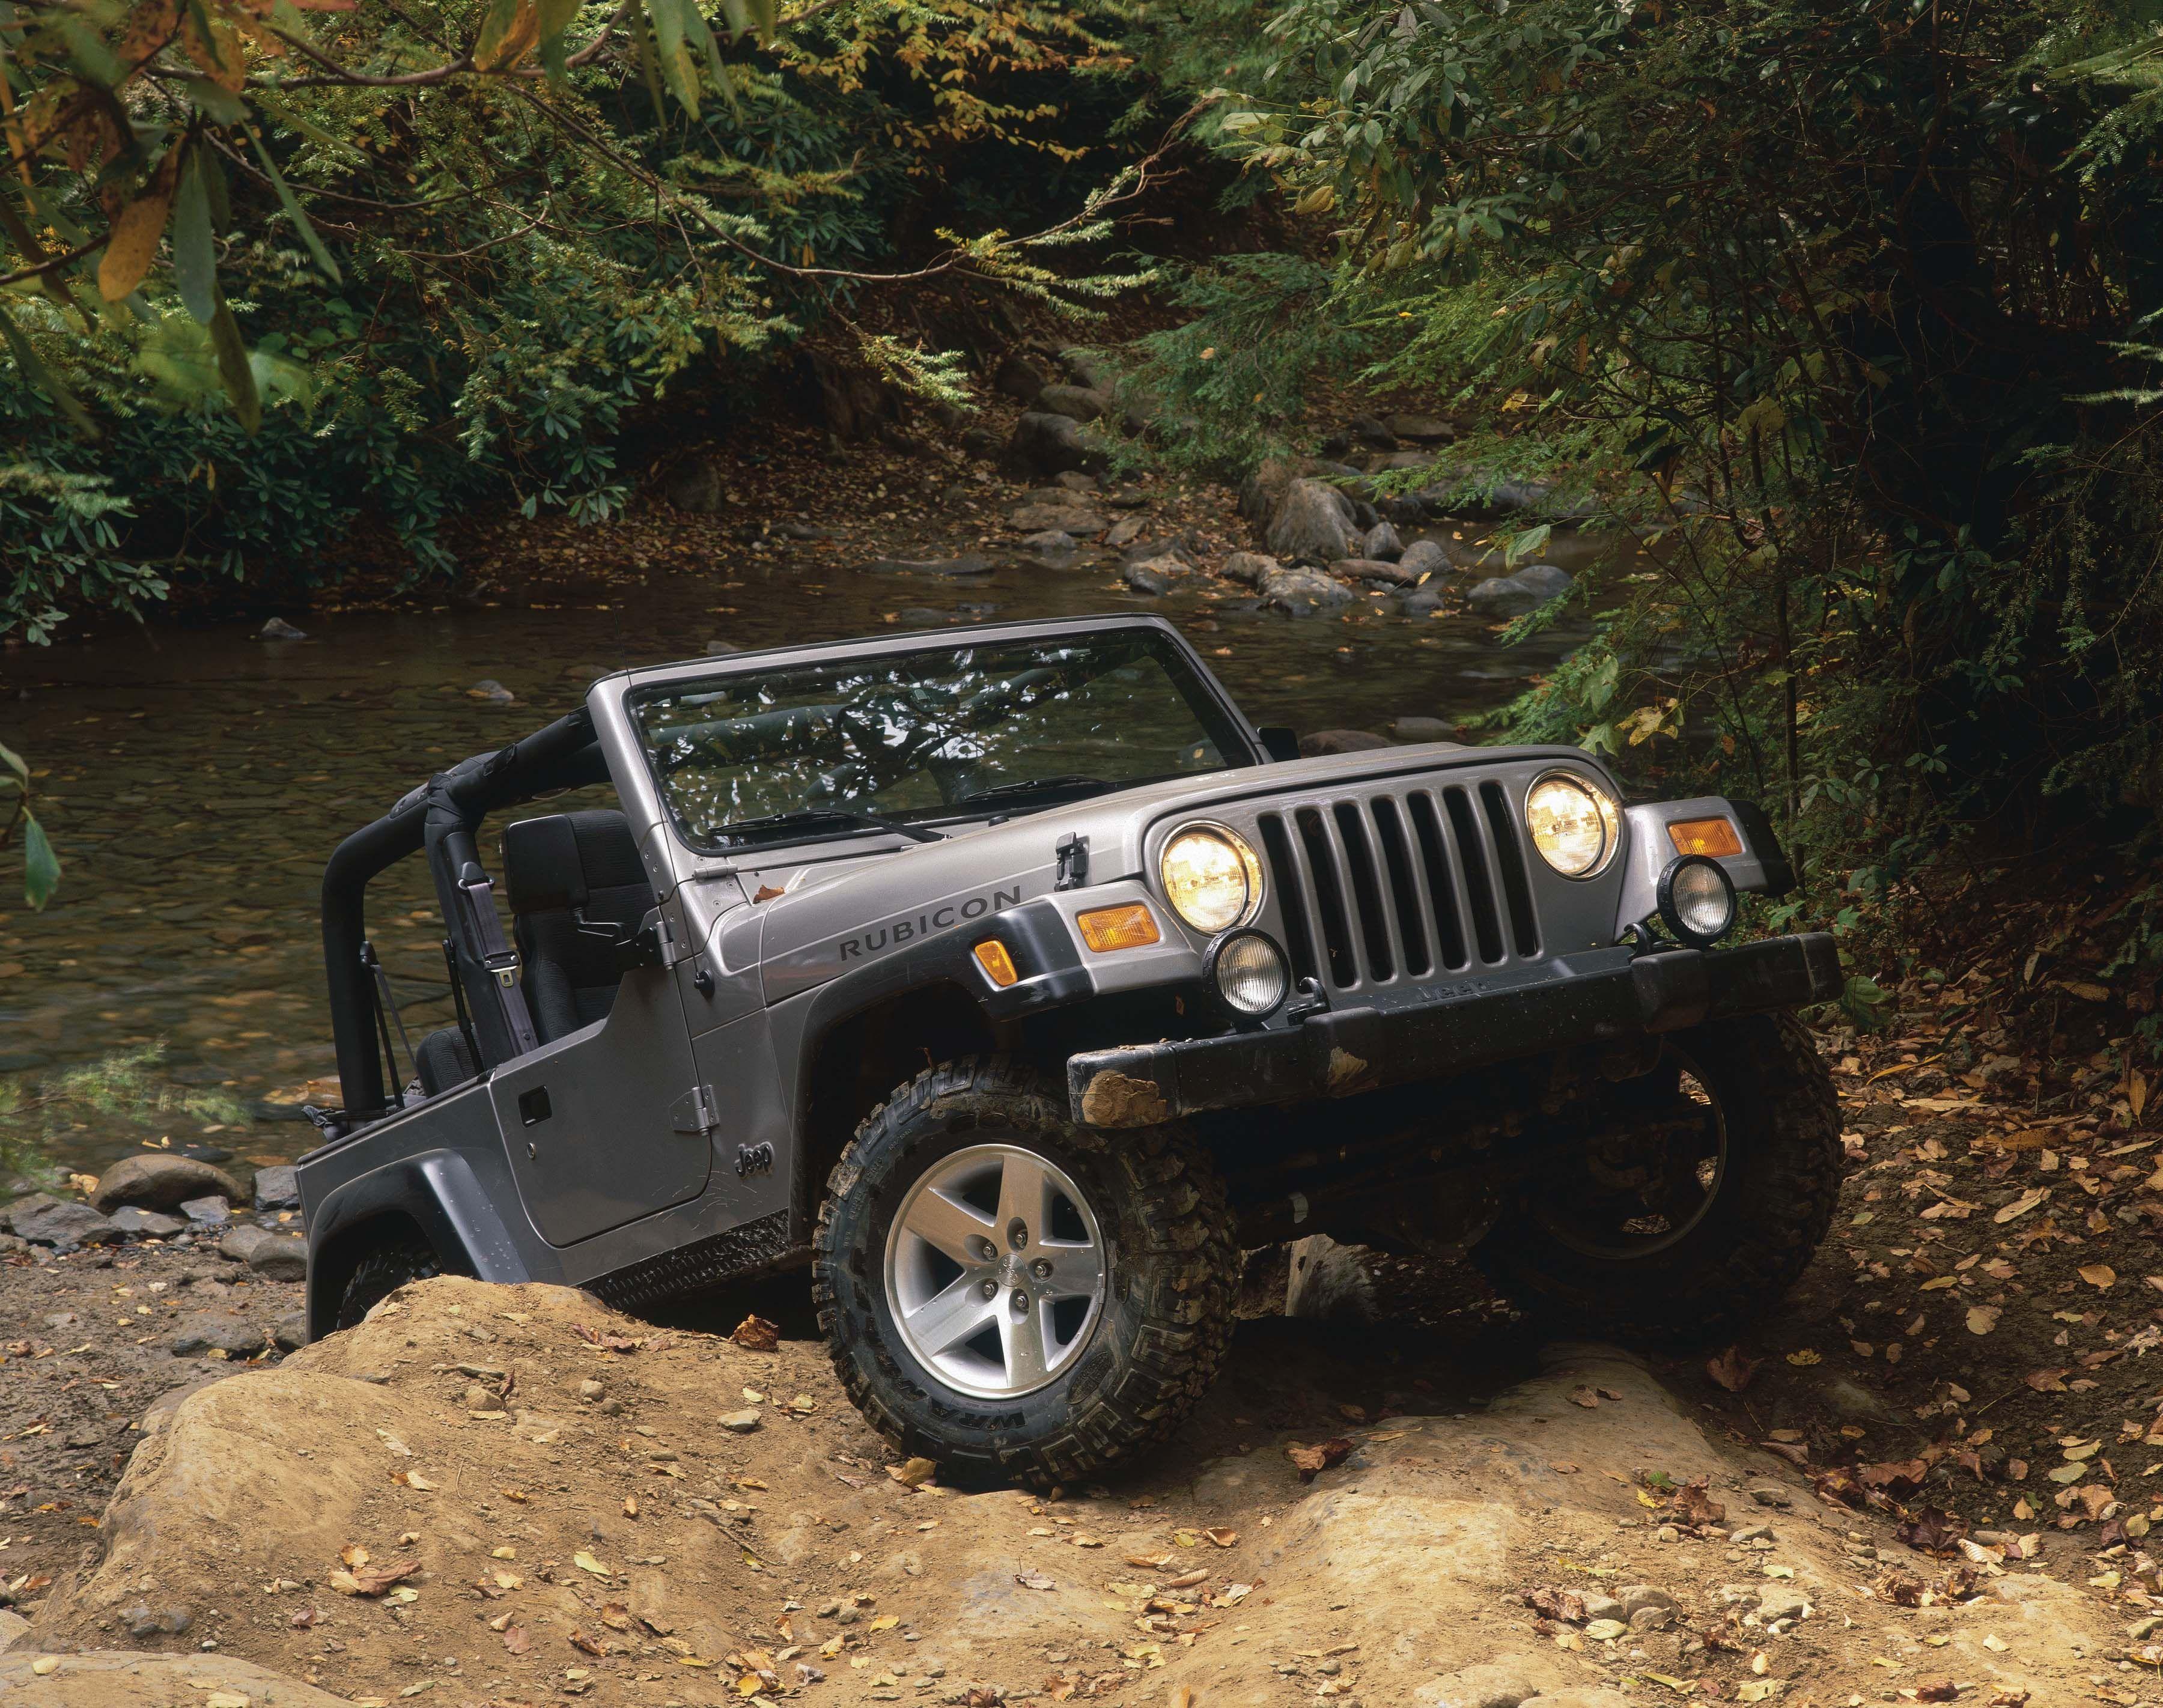 Jeep Wrangler Rubicon Mpg Jpeg Http Carimagescolay Casa Jeep Wrangler Rubicon Mpg Jpeg Html